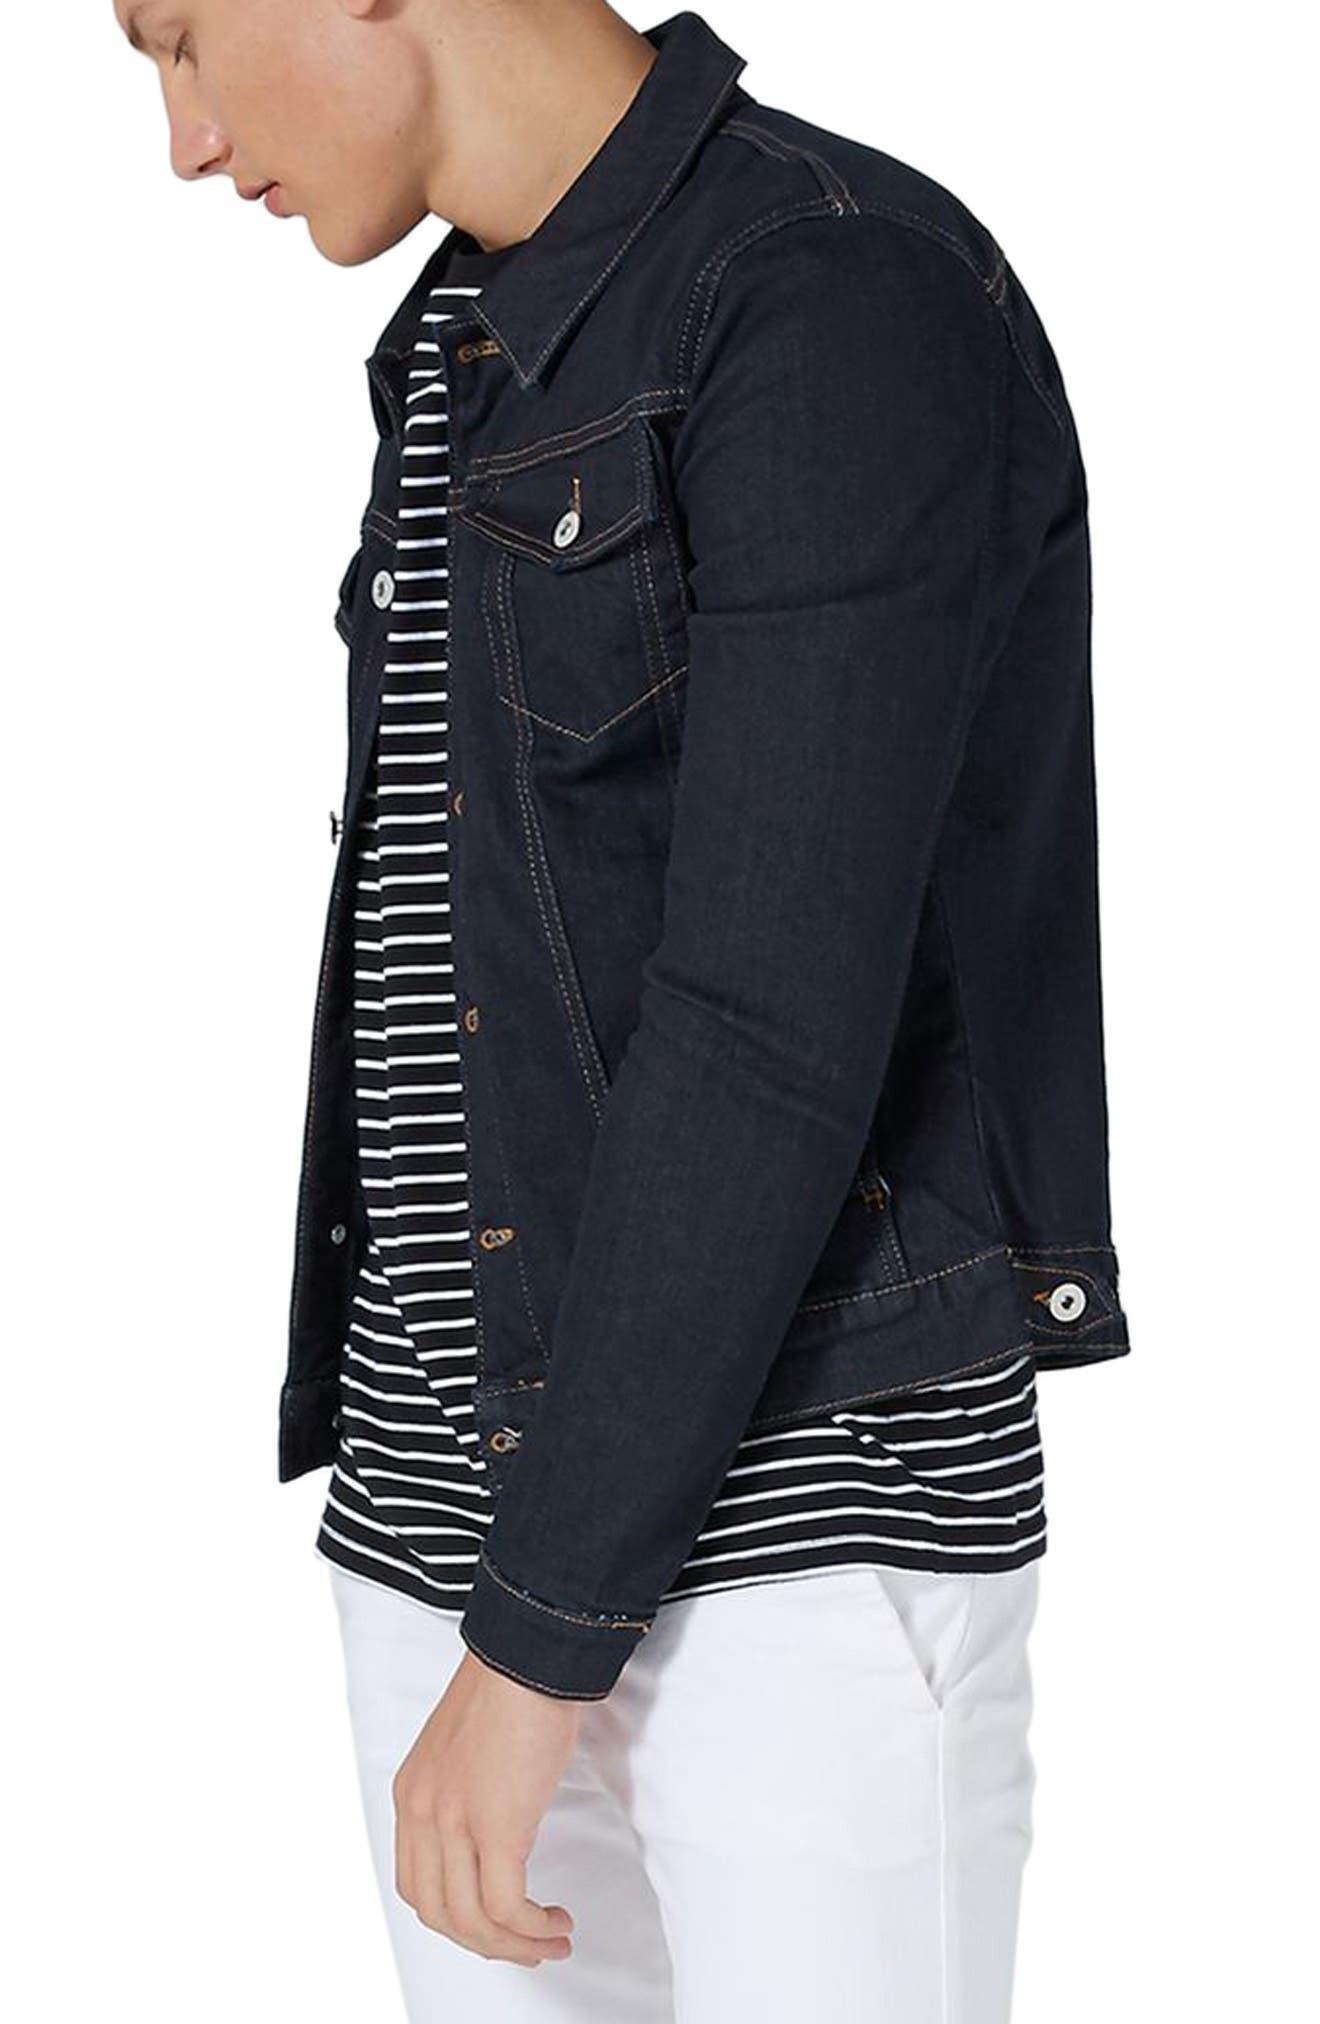 Raw Muscle Fit Denim Jacket,                         Main,                         color, Dark Blue